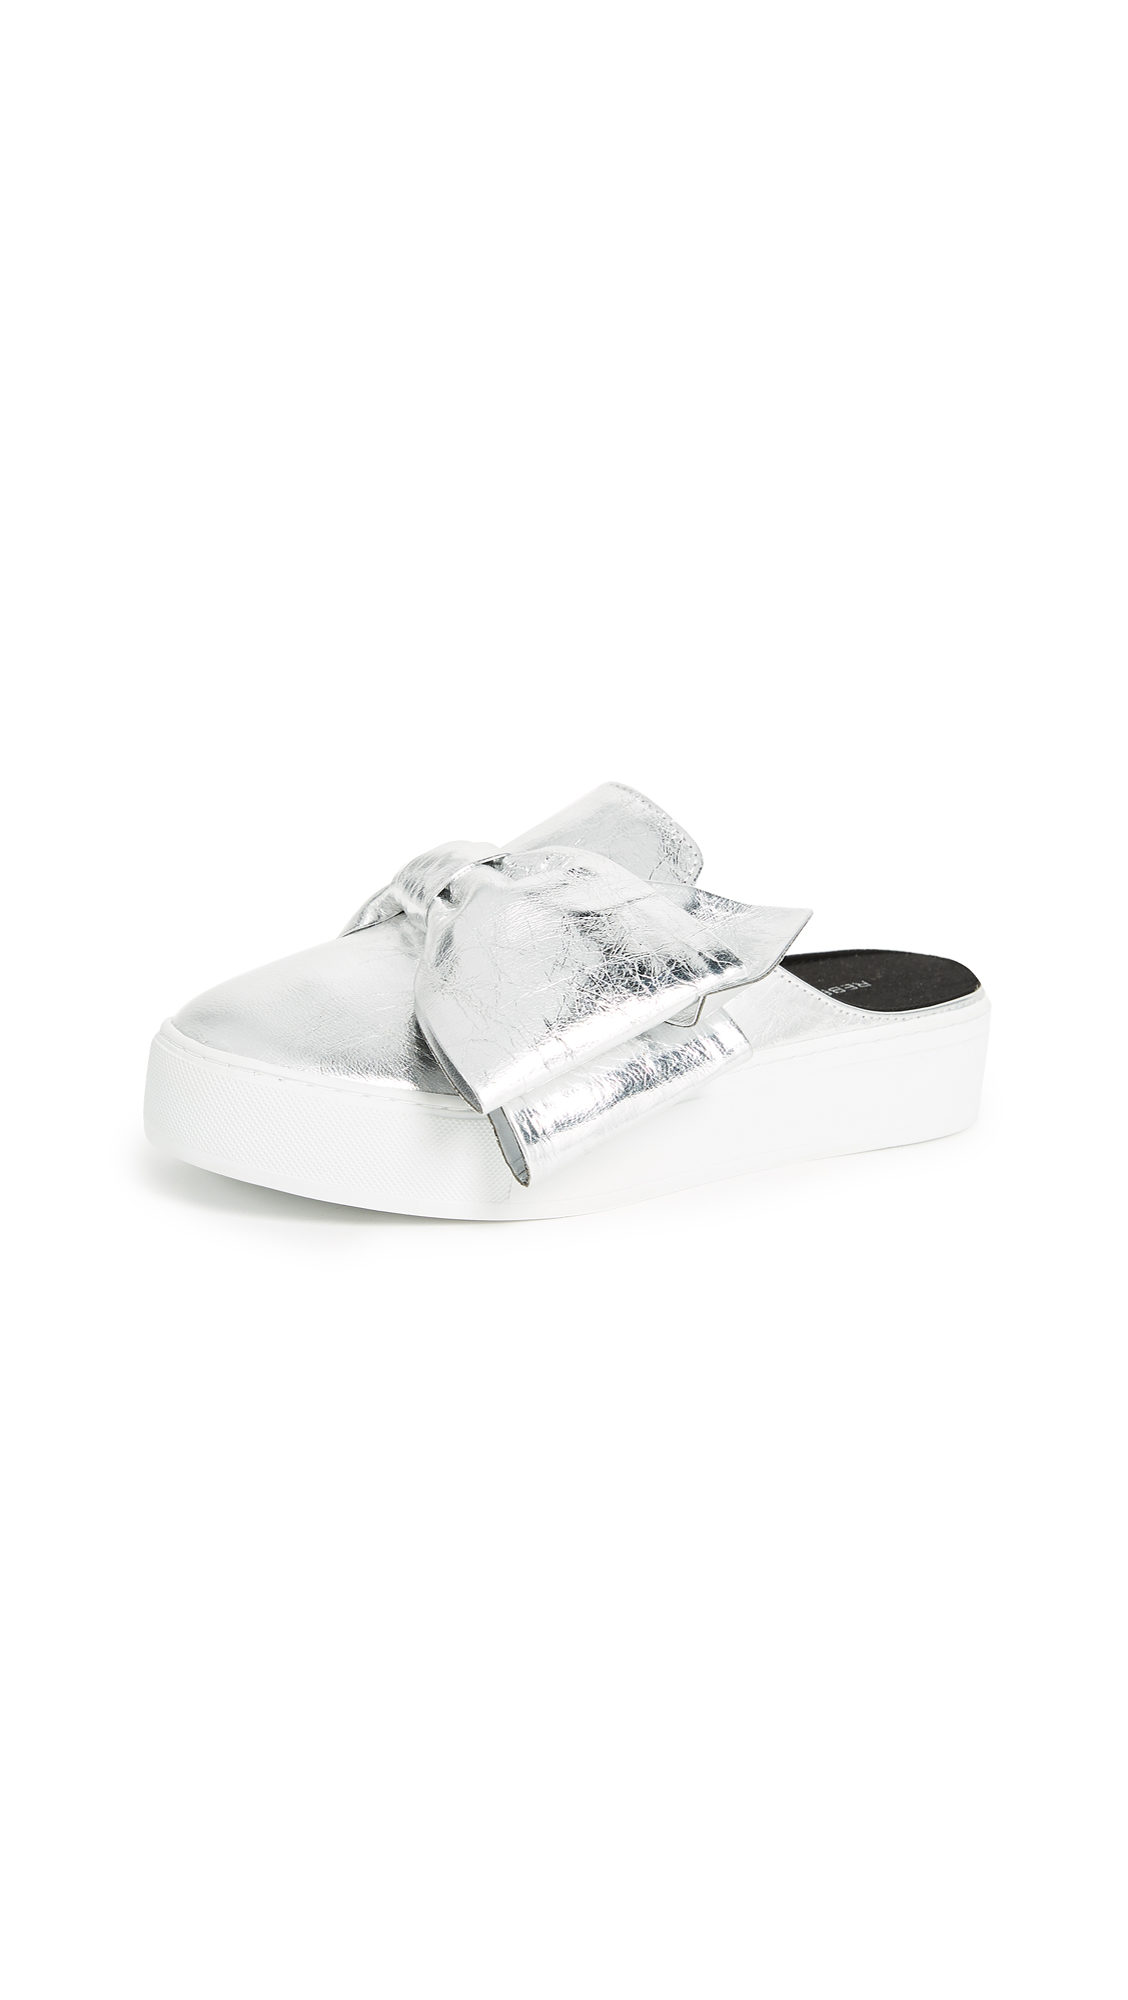 Rebecca Minkoff Neva Mule Sneakers - Silver